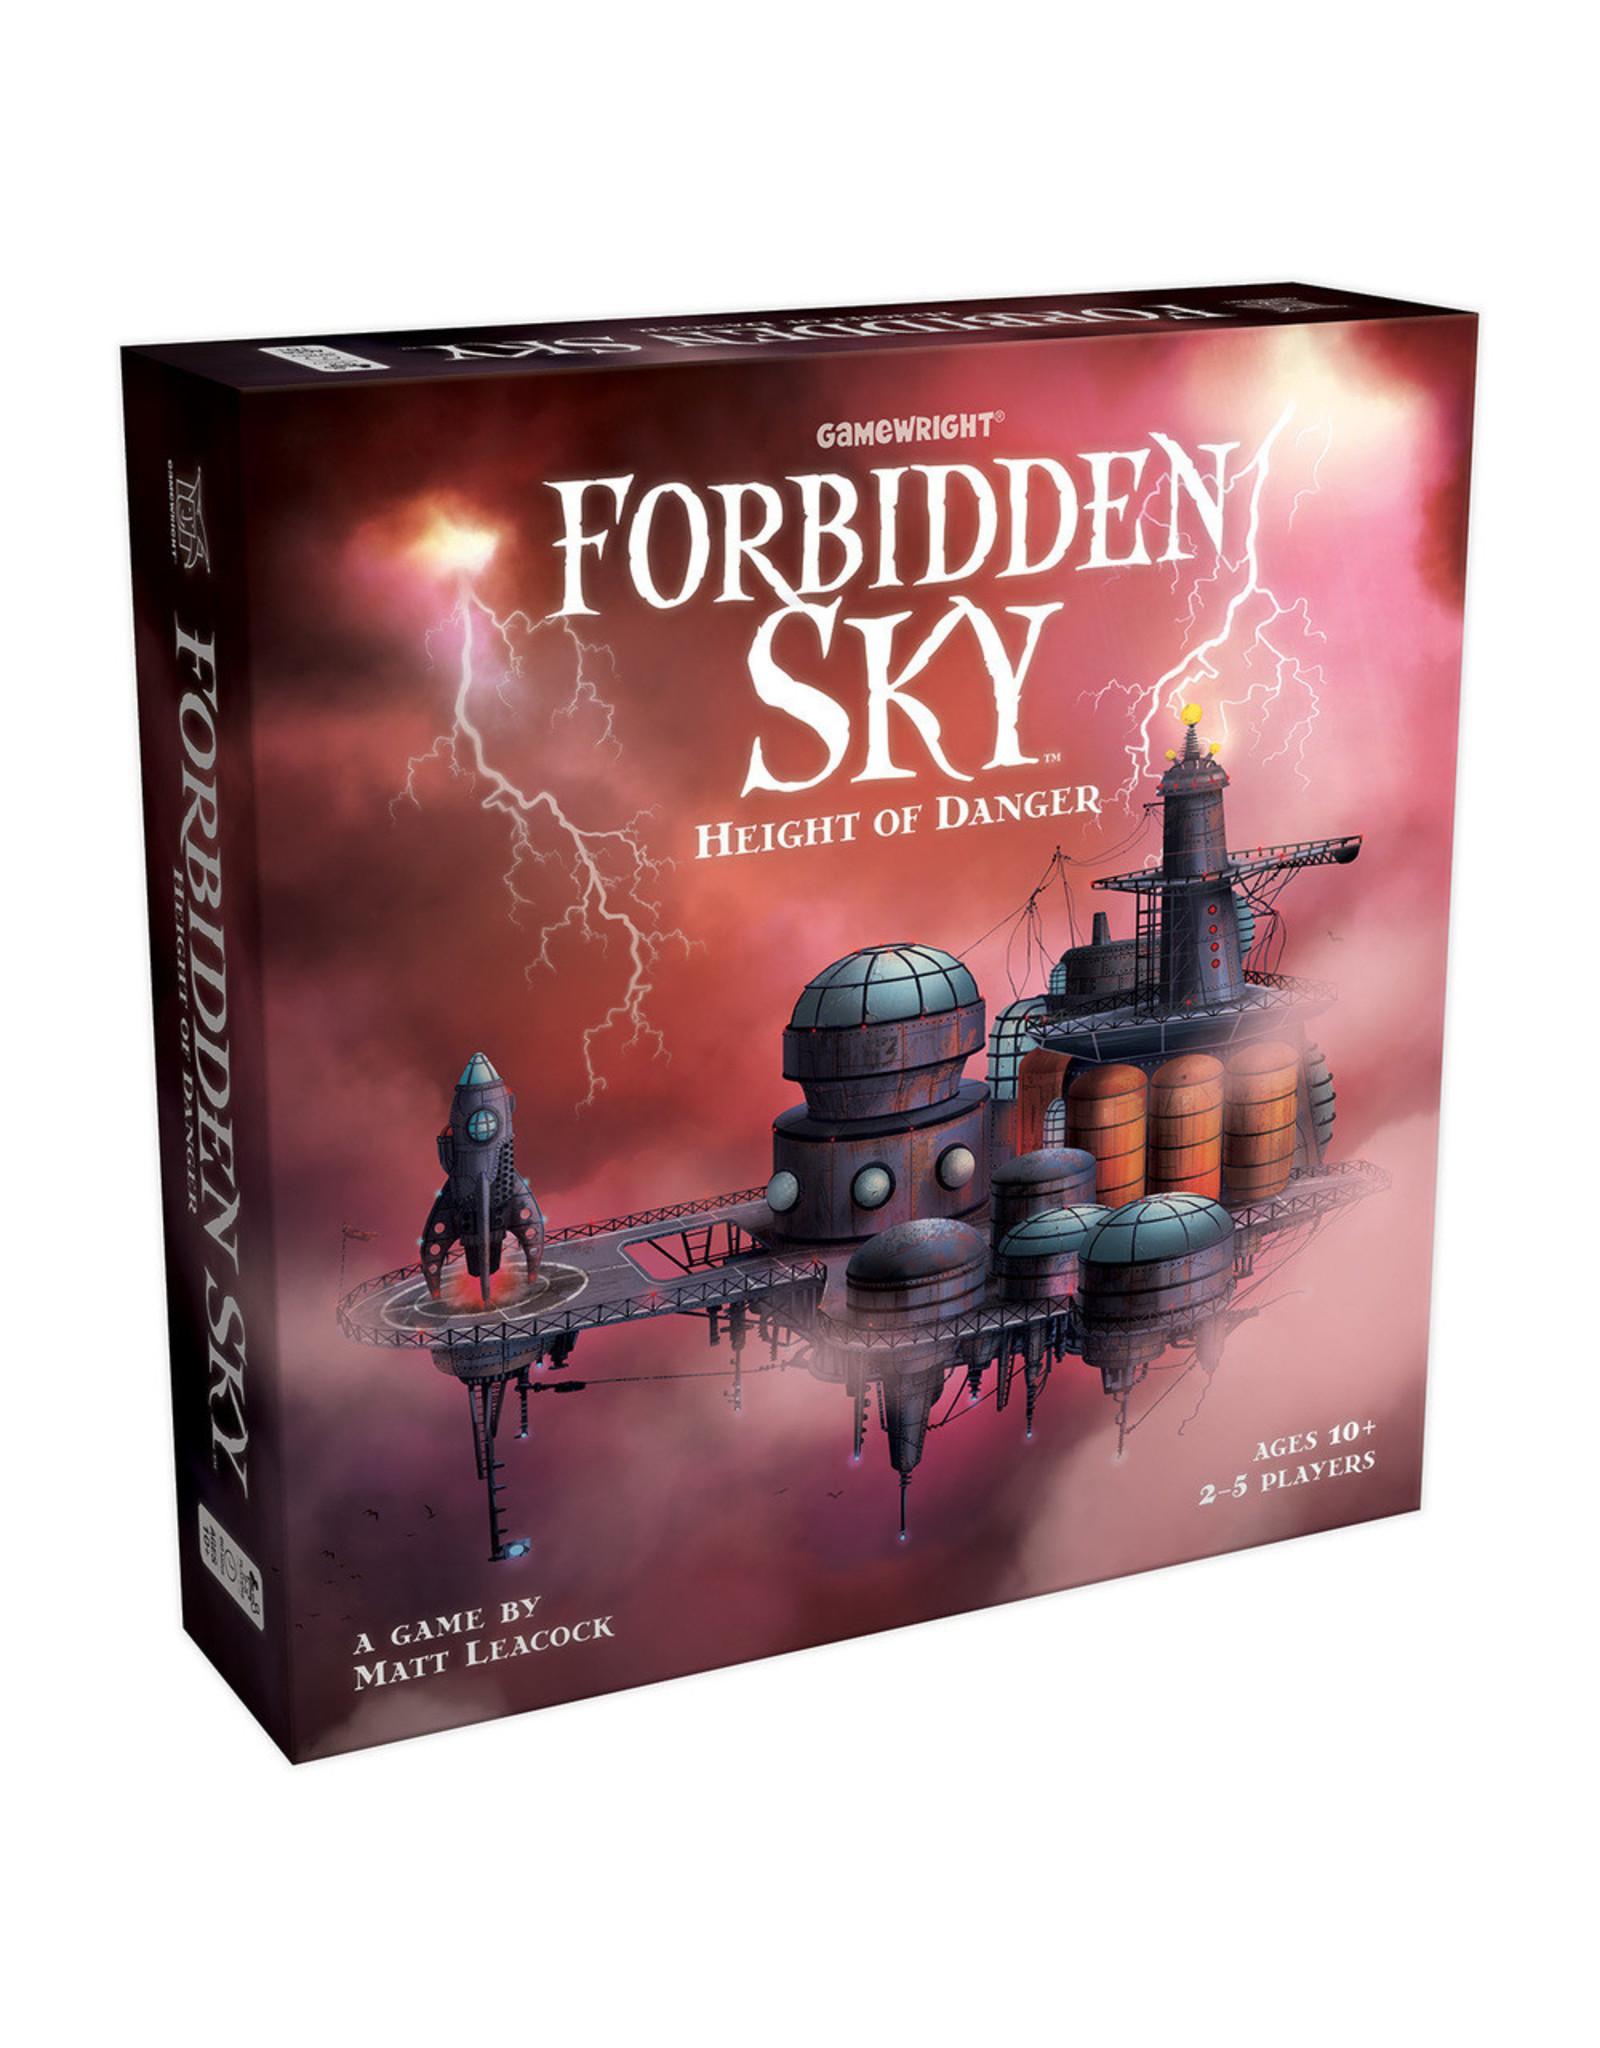 Gamewright Forbidden Sky Game